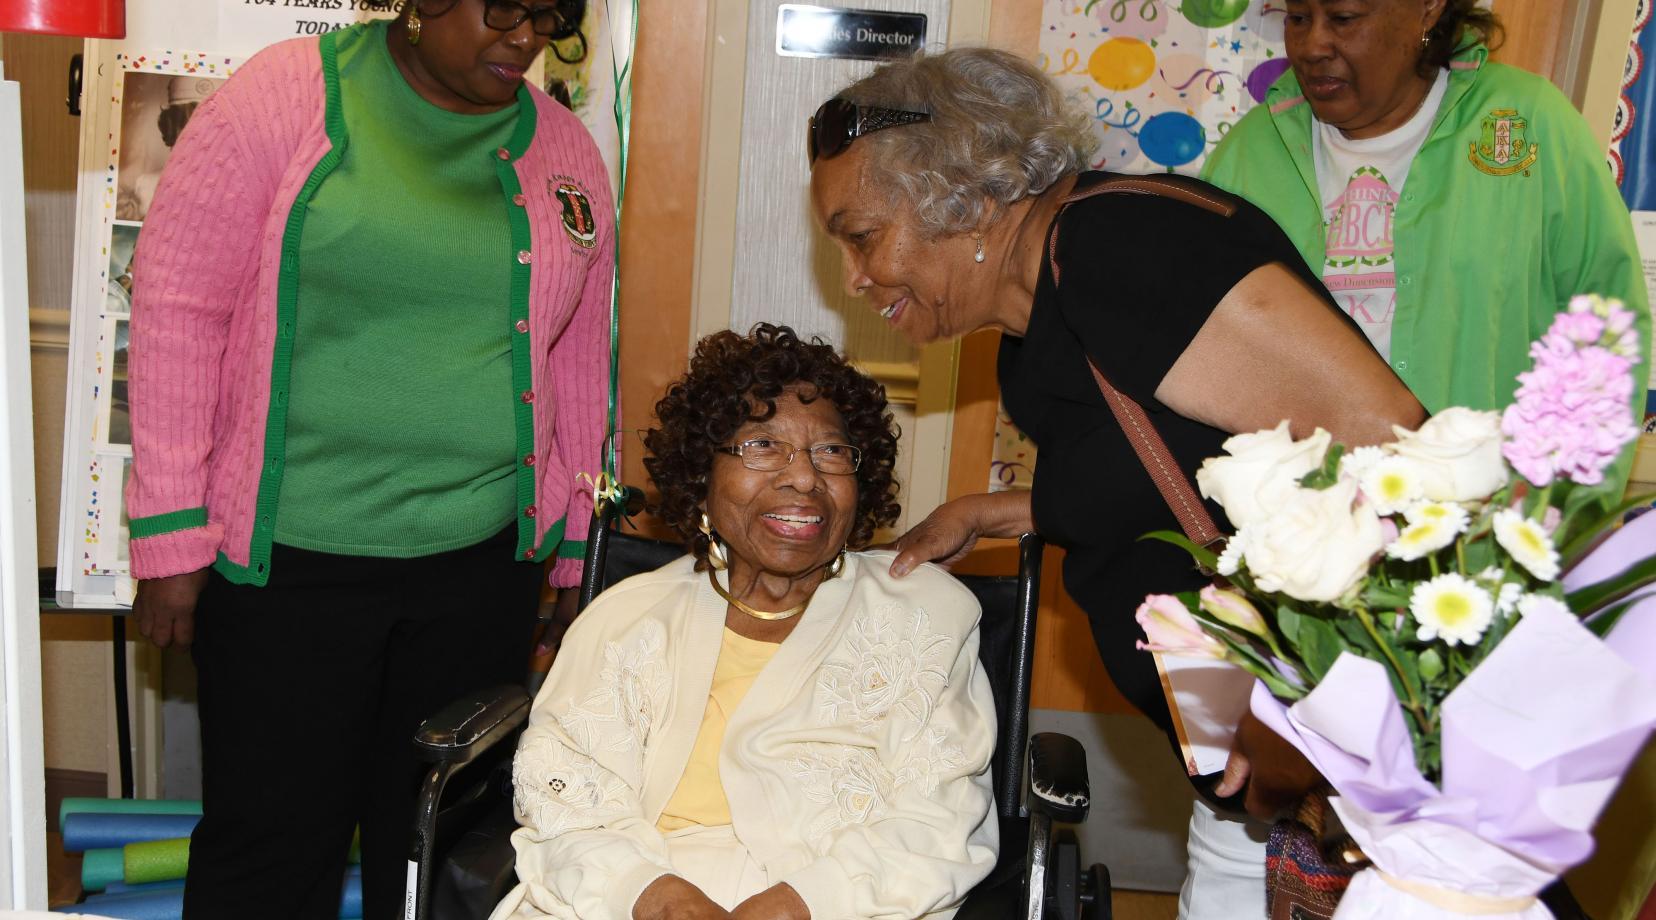 Courtney Stevenson (seated) talks with AKA sorority sister Peggy Swygert at her 104th birthday celebration at the Capital Rehabilitation Center where she lives.